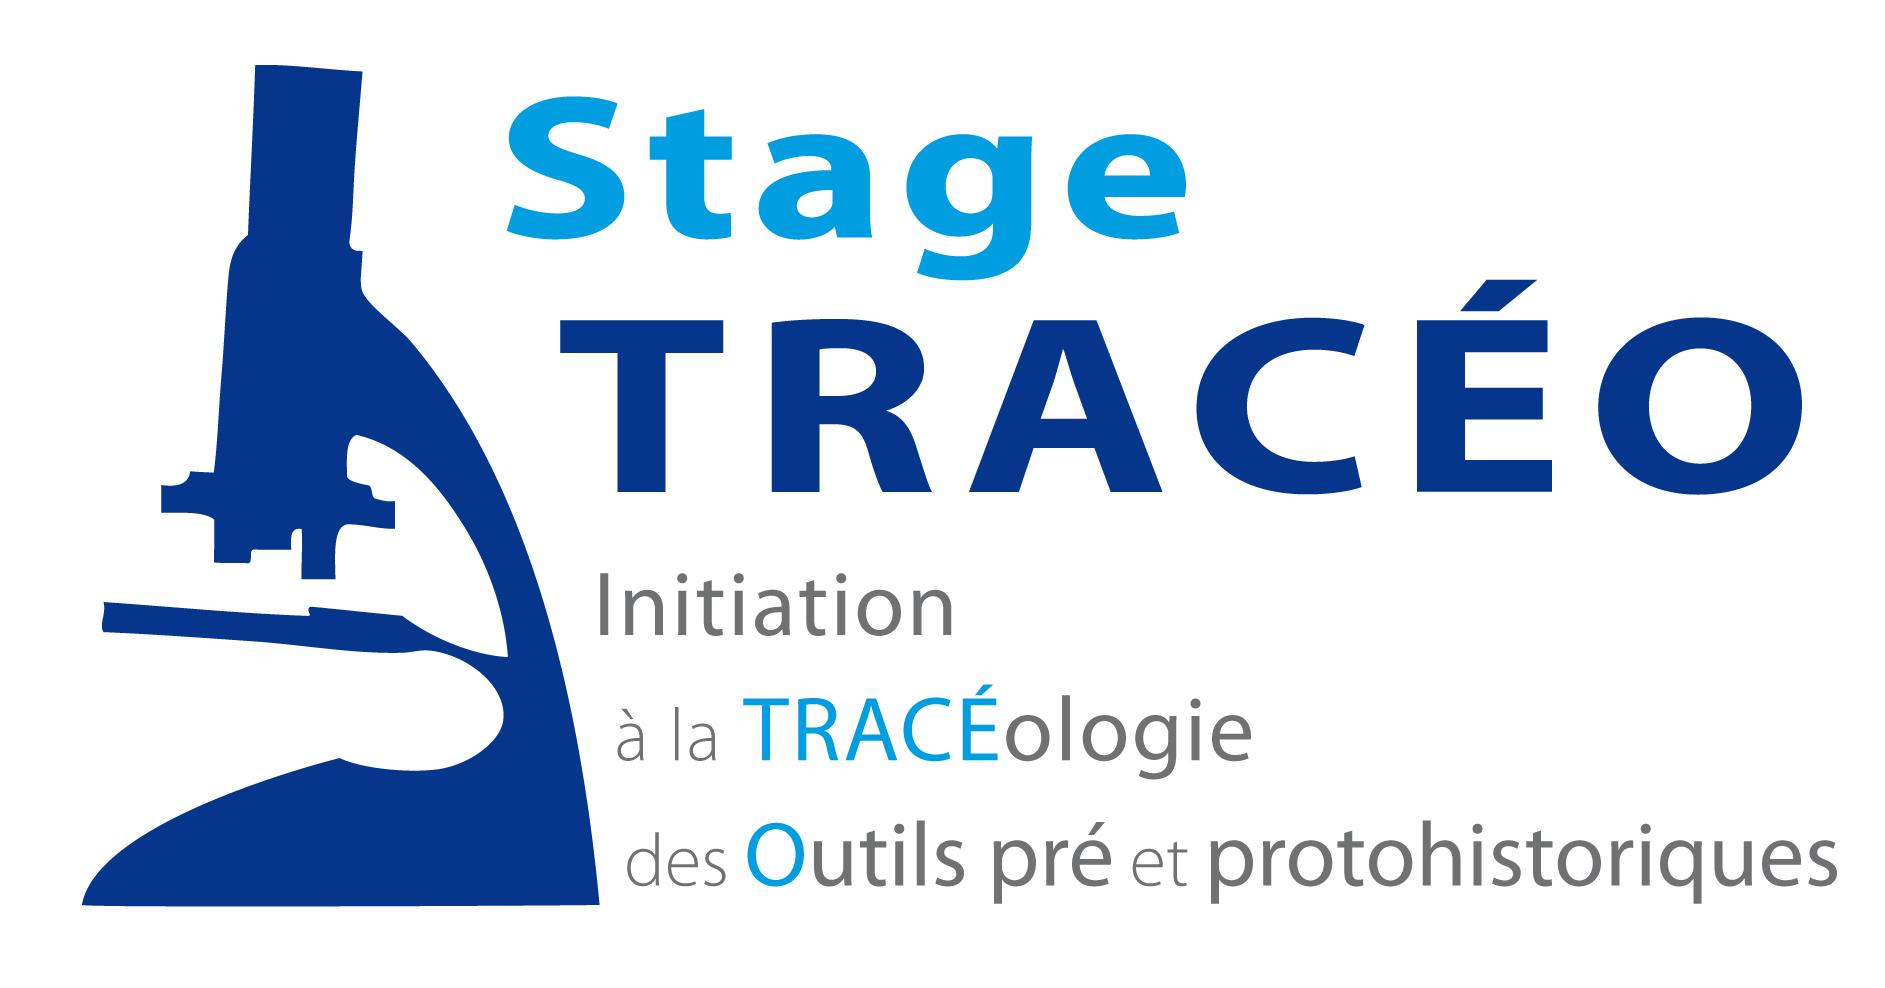 logo_traceo_v3b-02.jpg